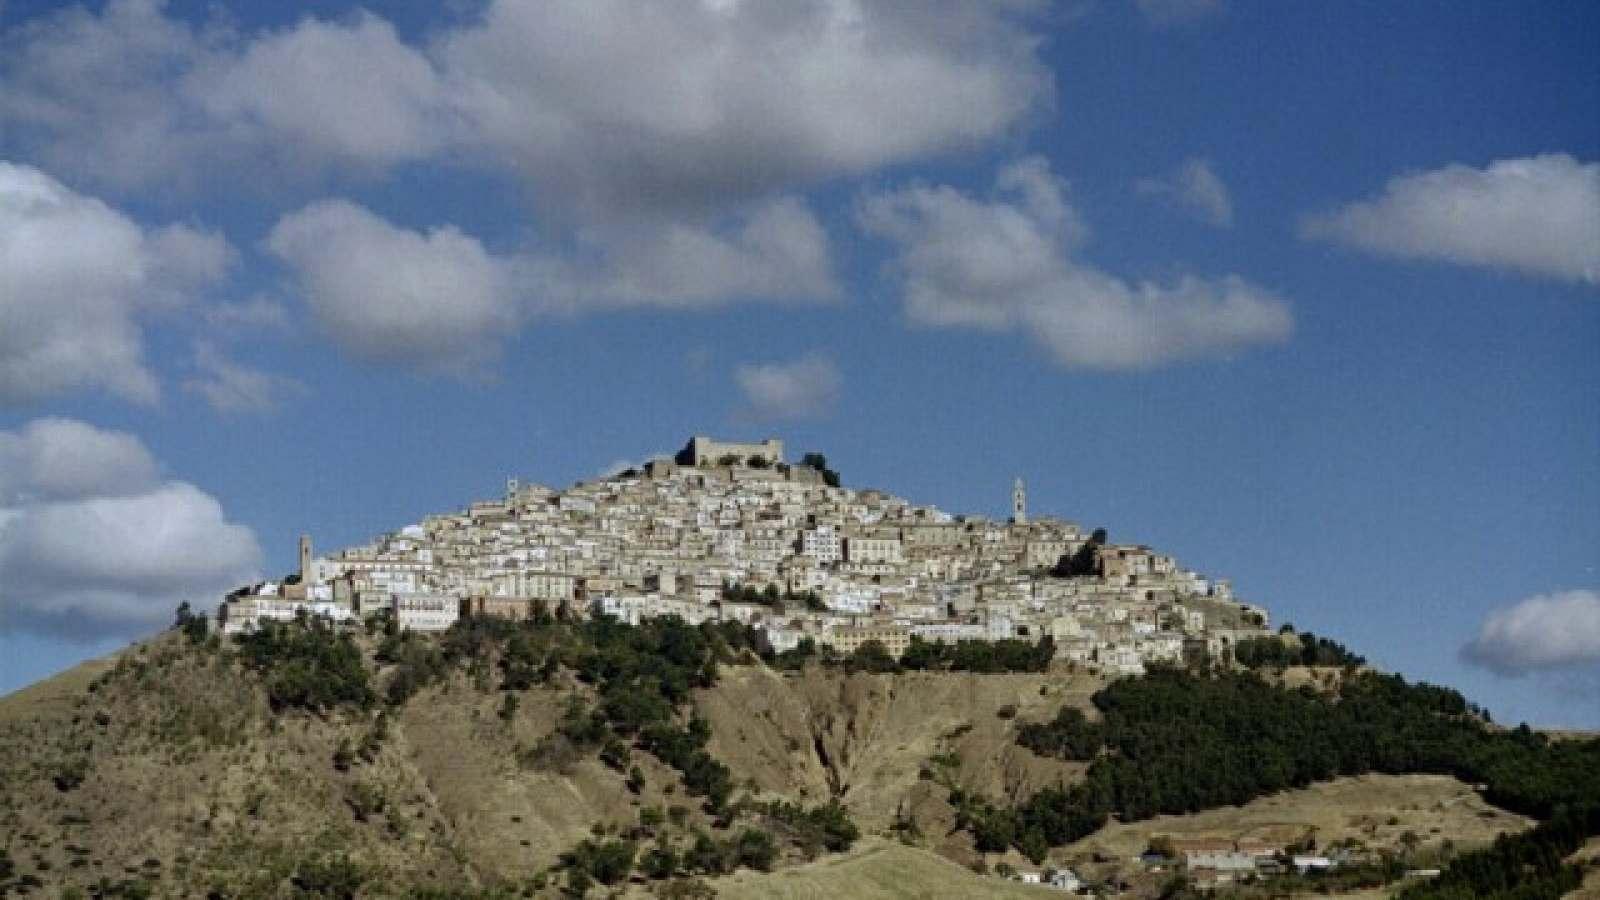 Sant'Agata di Puglia - Panorama